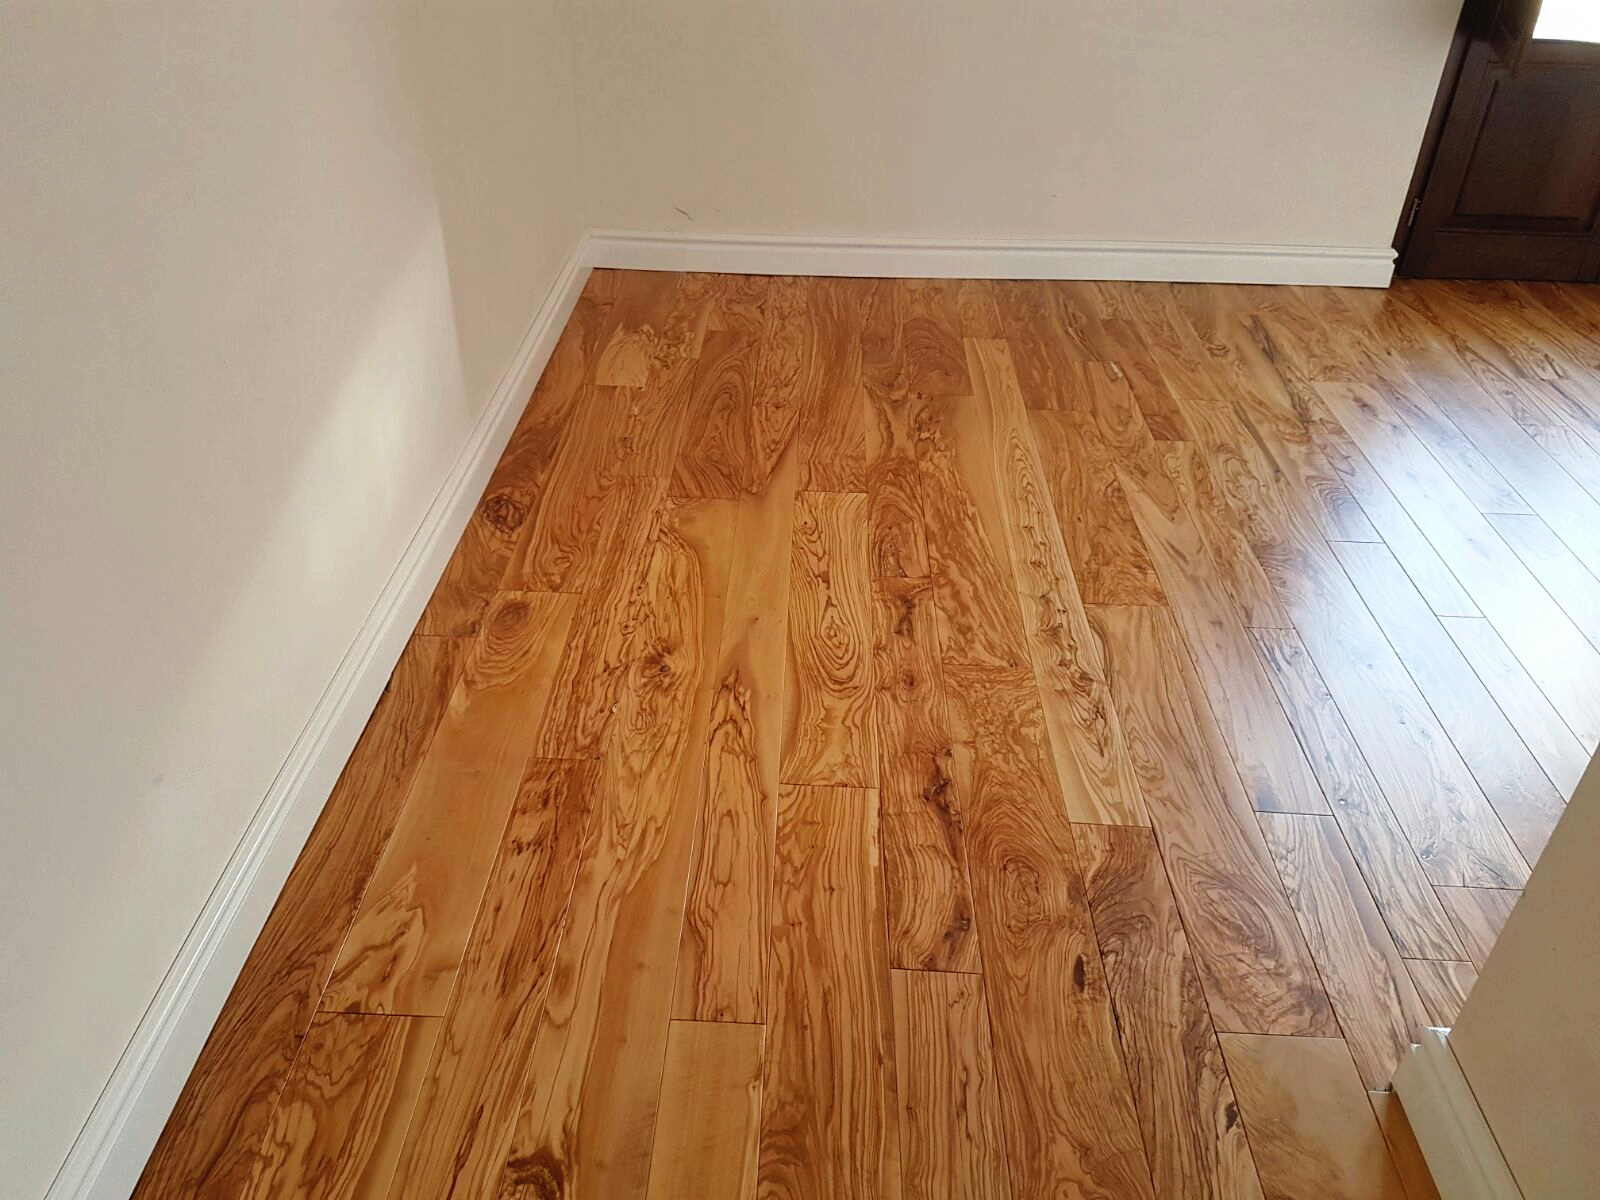 Colocar suelo de madera cheap colocar tarima flotante en saln with colocar suelo de madera se - Suelos de madera maciza ...